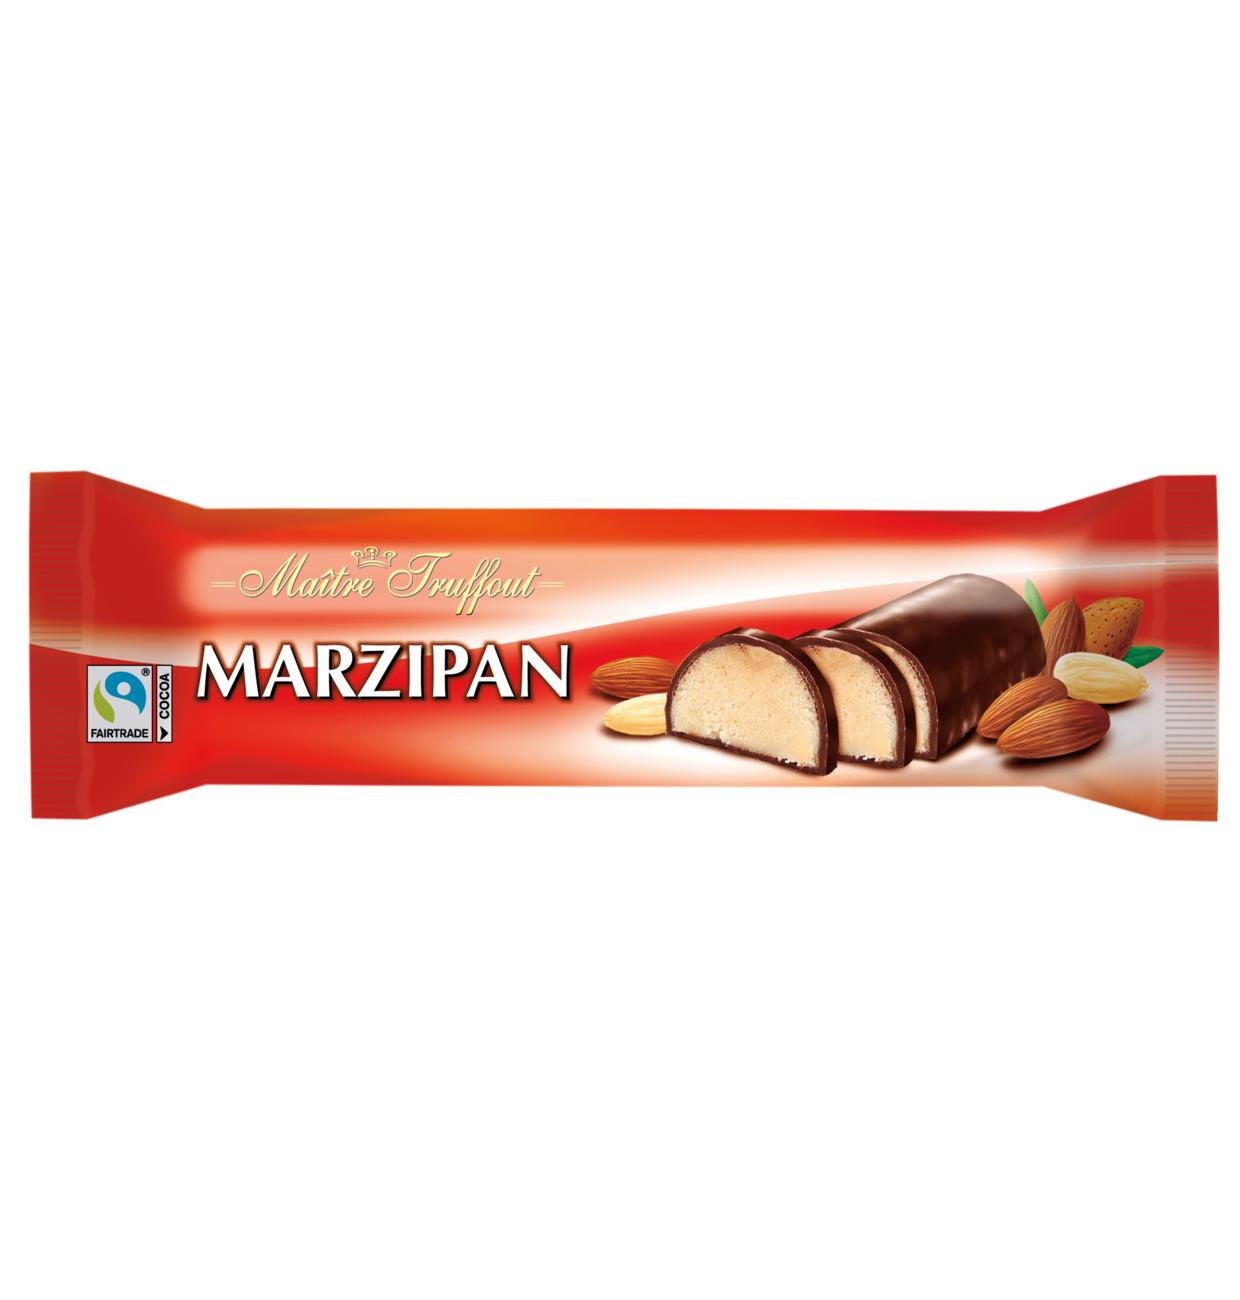 Marzipanriegel mit Zartbitterschokolade